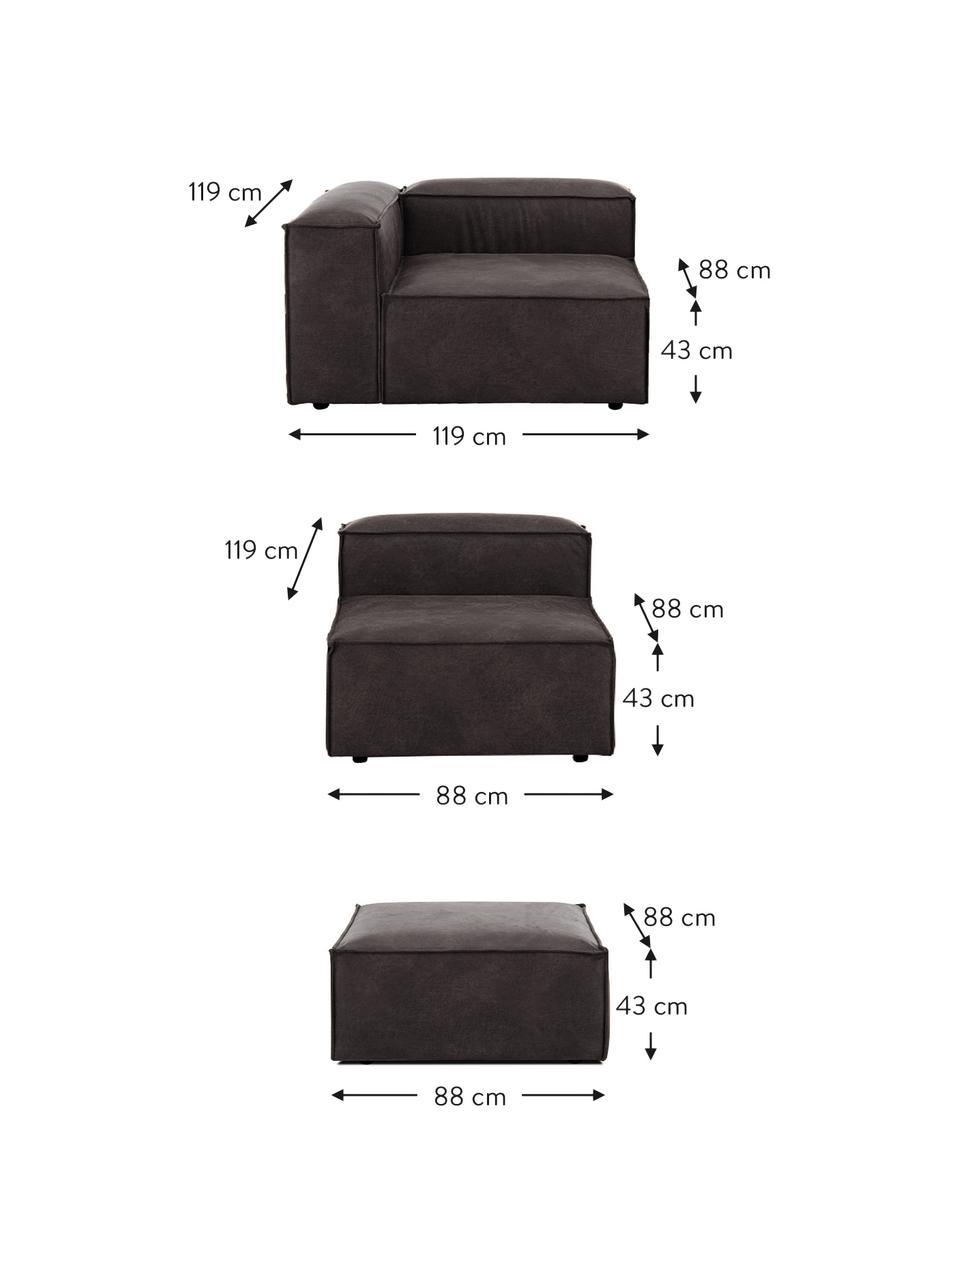 Modulares Sofa Lennon (4-Sitzer) mit Hocker in Braungrau aus recyceltem Leder, Bezug: Recyceltes Leder (70% Led, Gestell: Massives Kiefernholz, Spe, Füße: Kunststoff Die Füße befin, Leder Braungrau, B 327 x T 207 cm